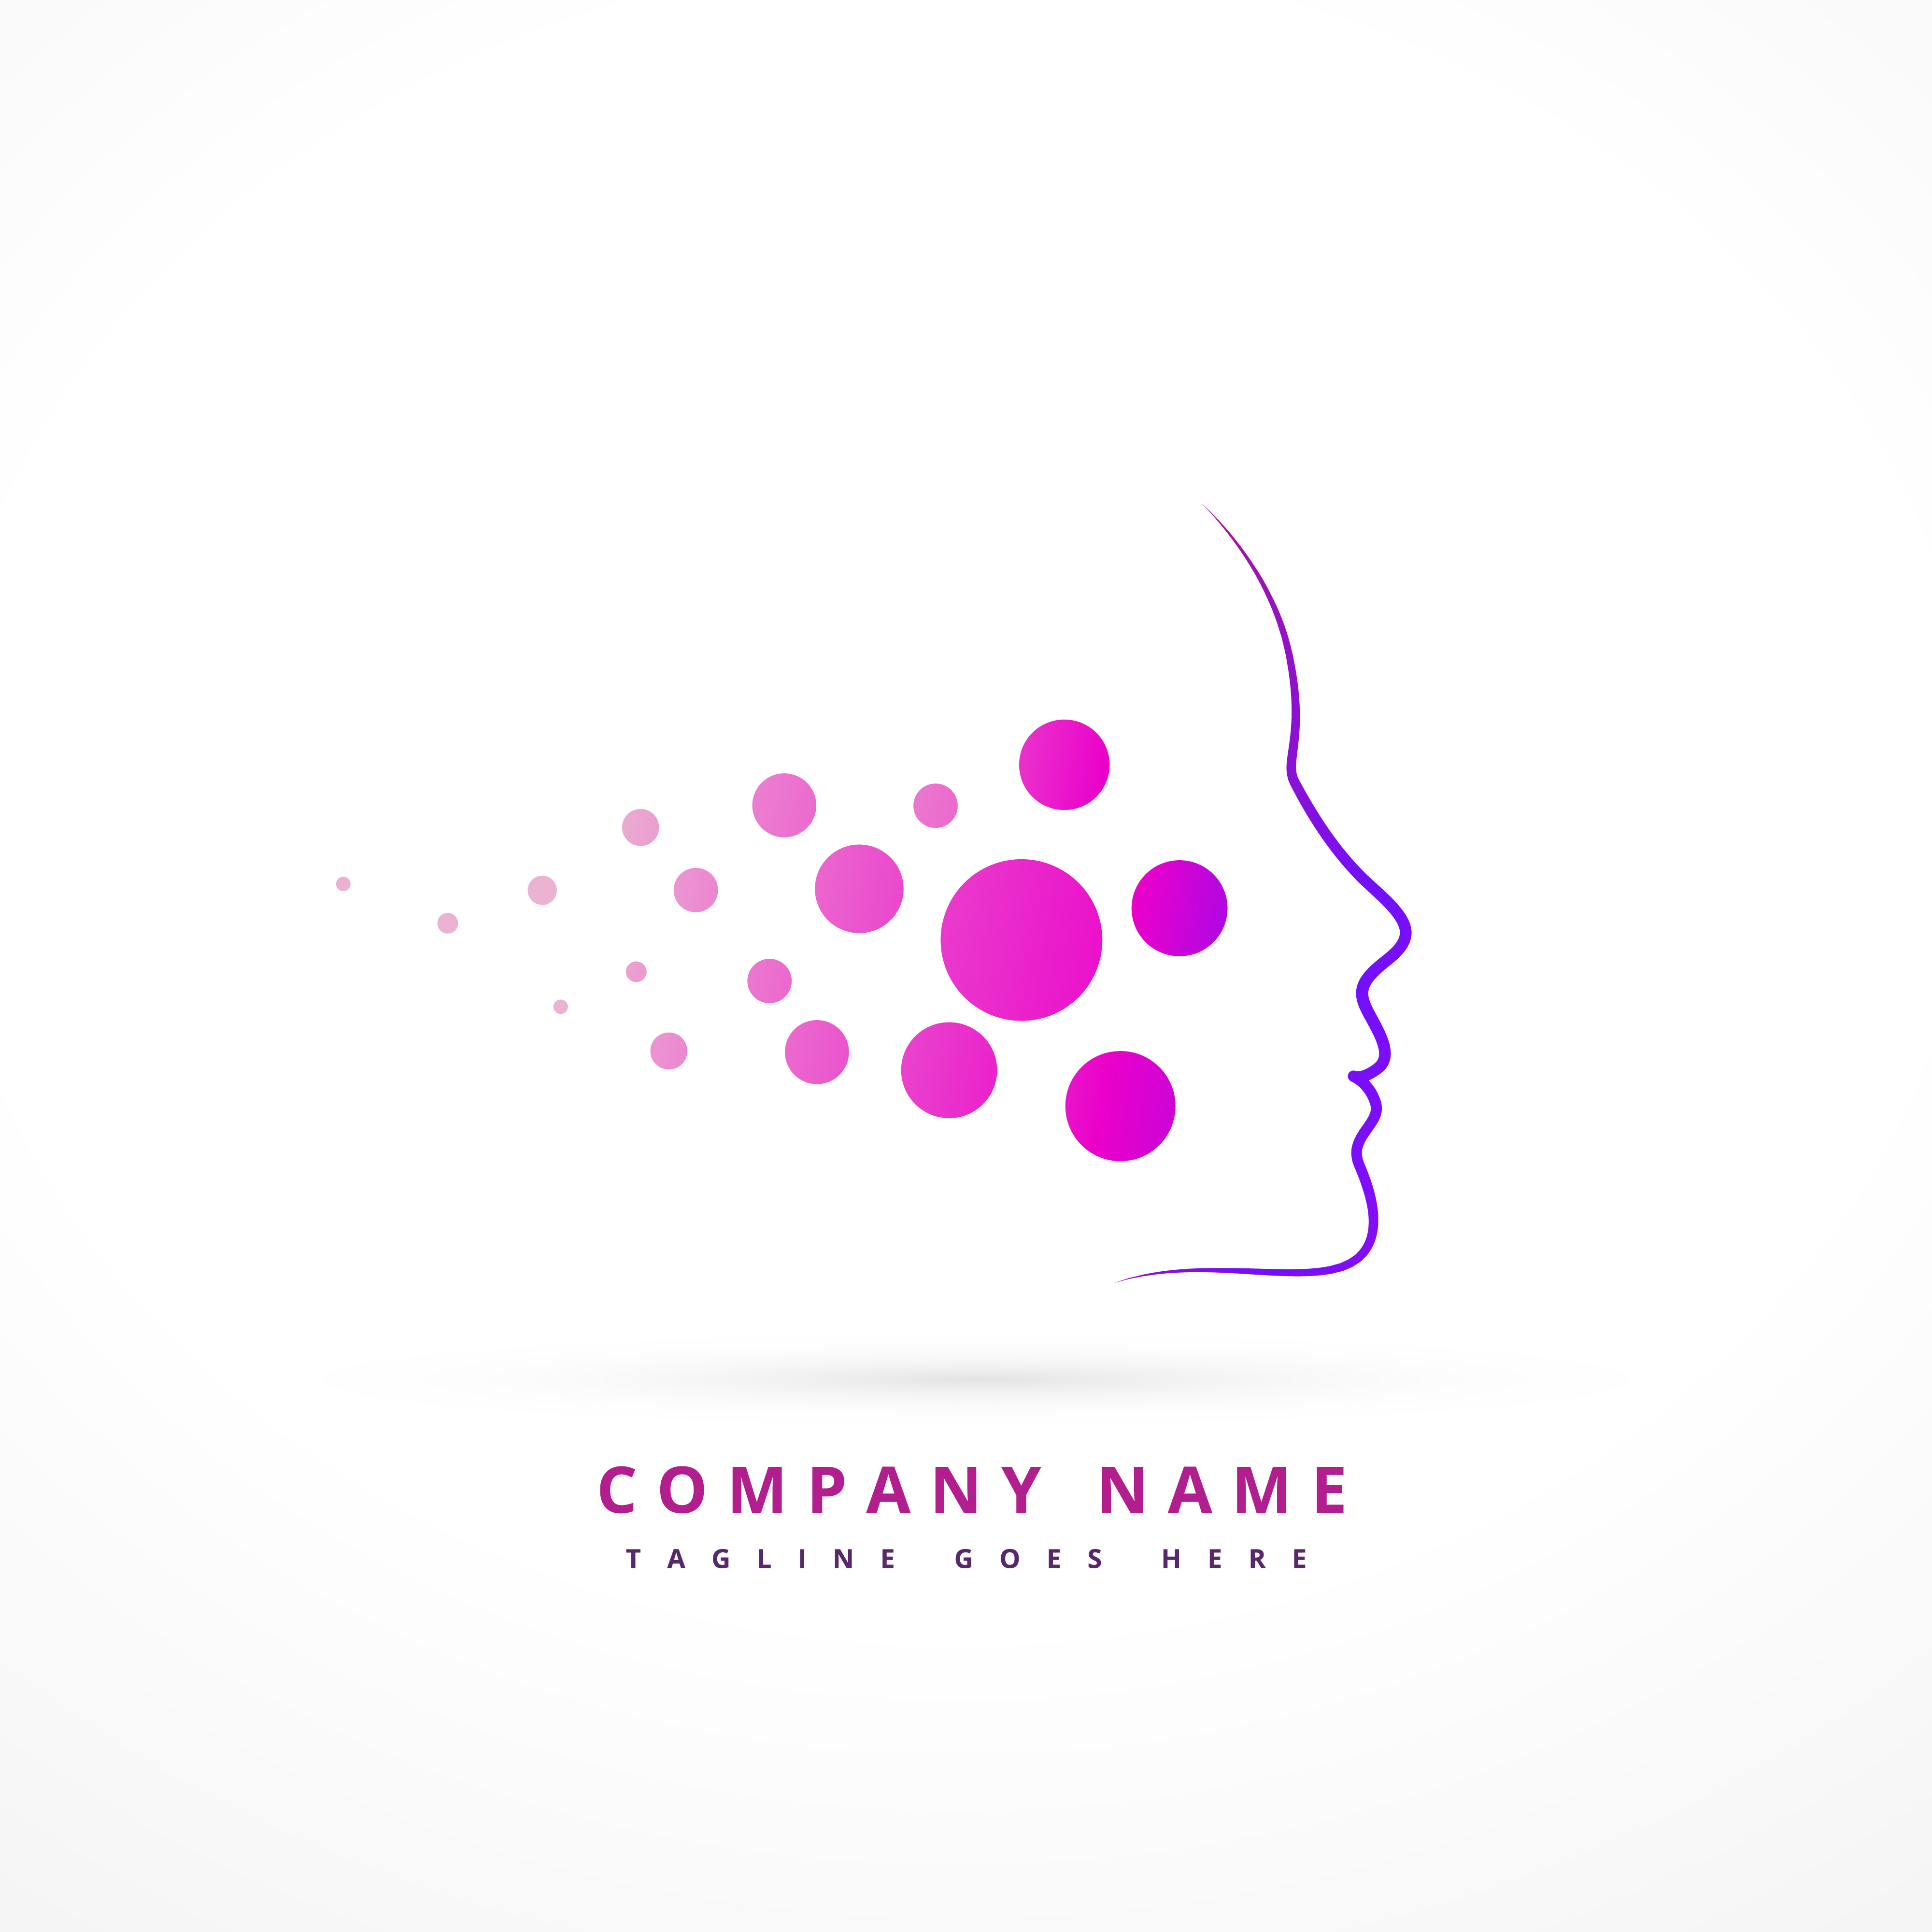 Gradient Abstract Company Logo Template: Skin Face Company Symbol Design Illustration